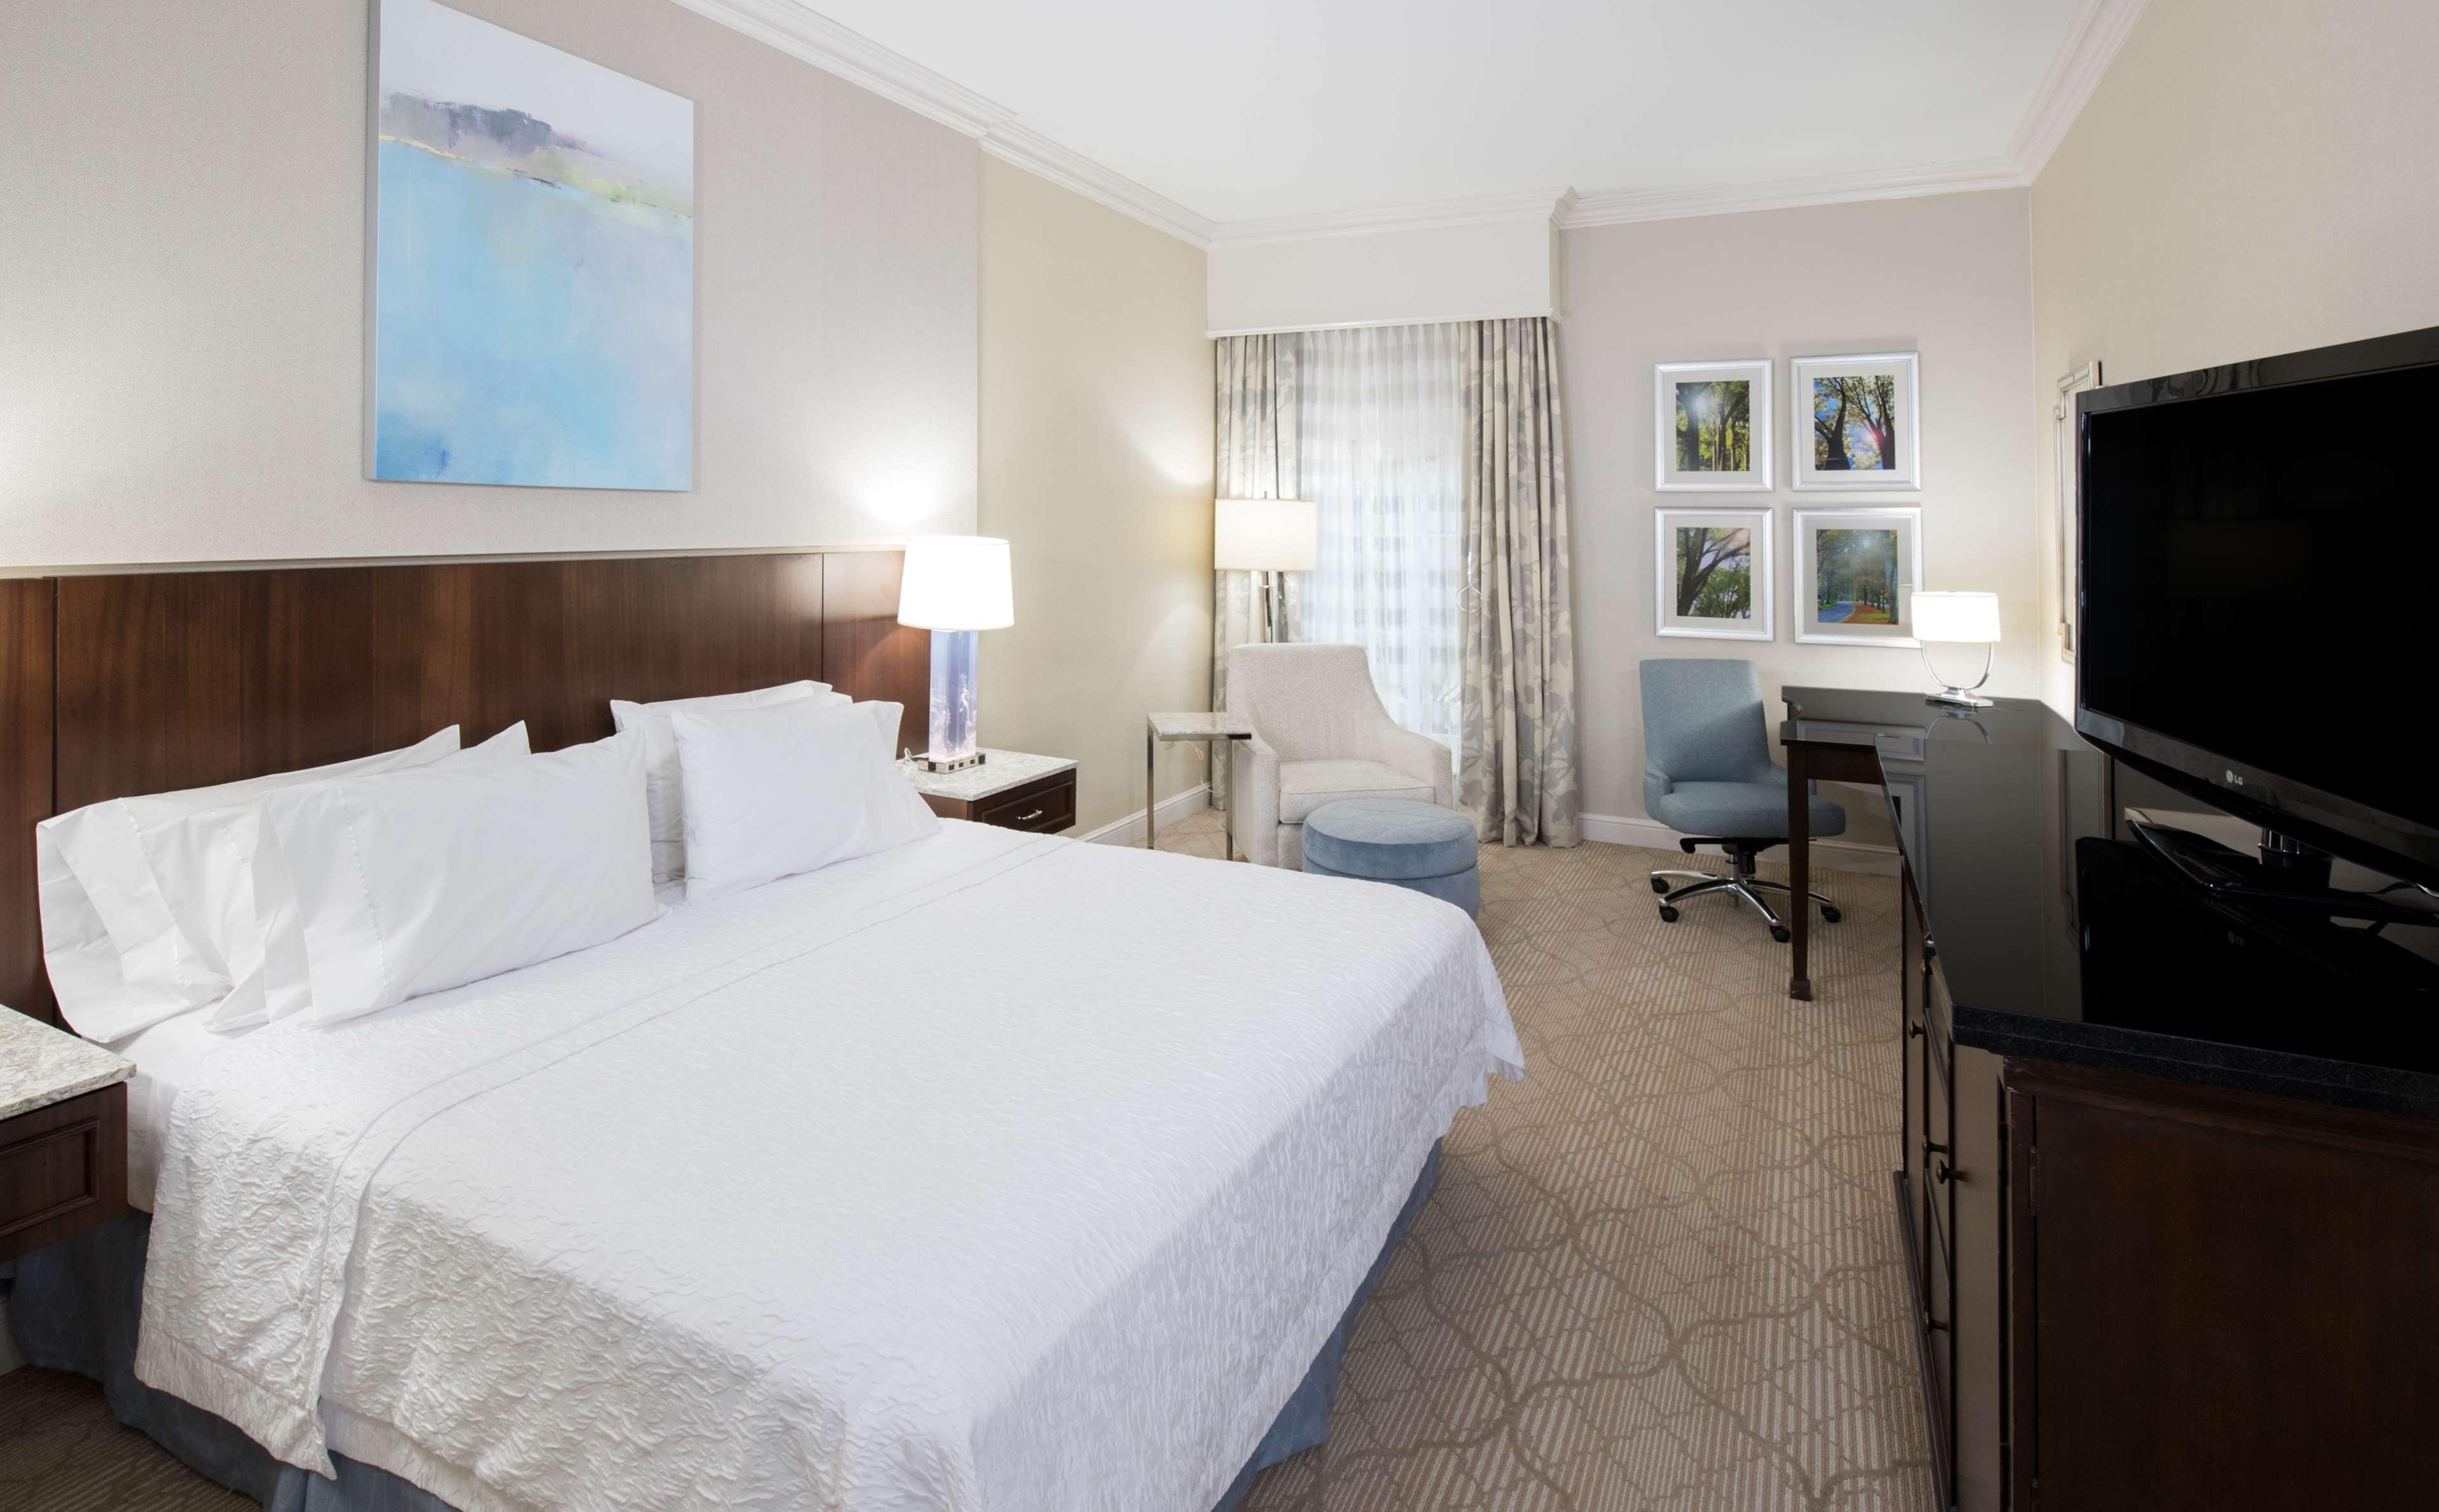 Hampton Inn & Suites Charlotte/South Park at Phillips Place image 24